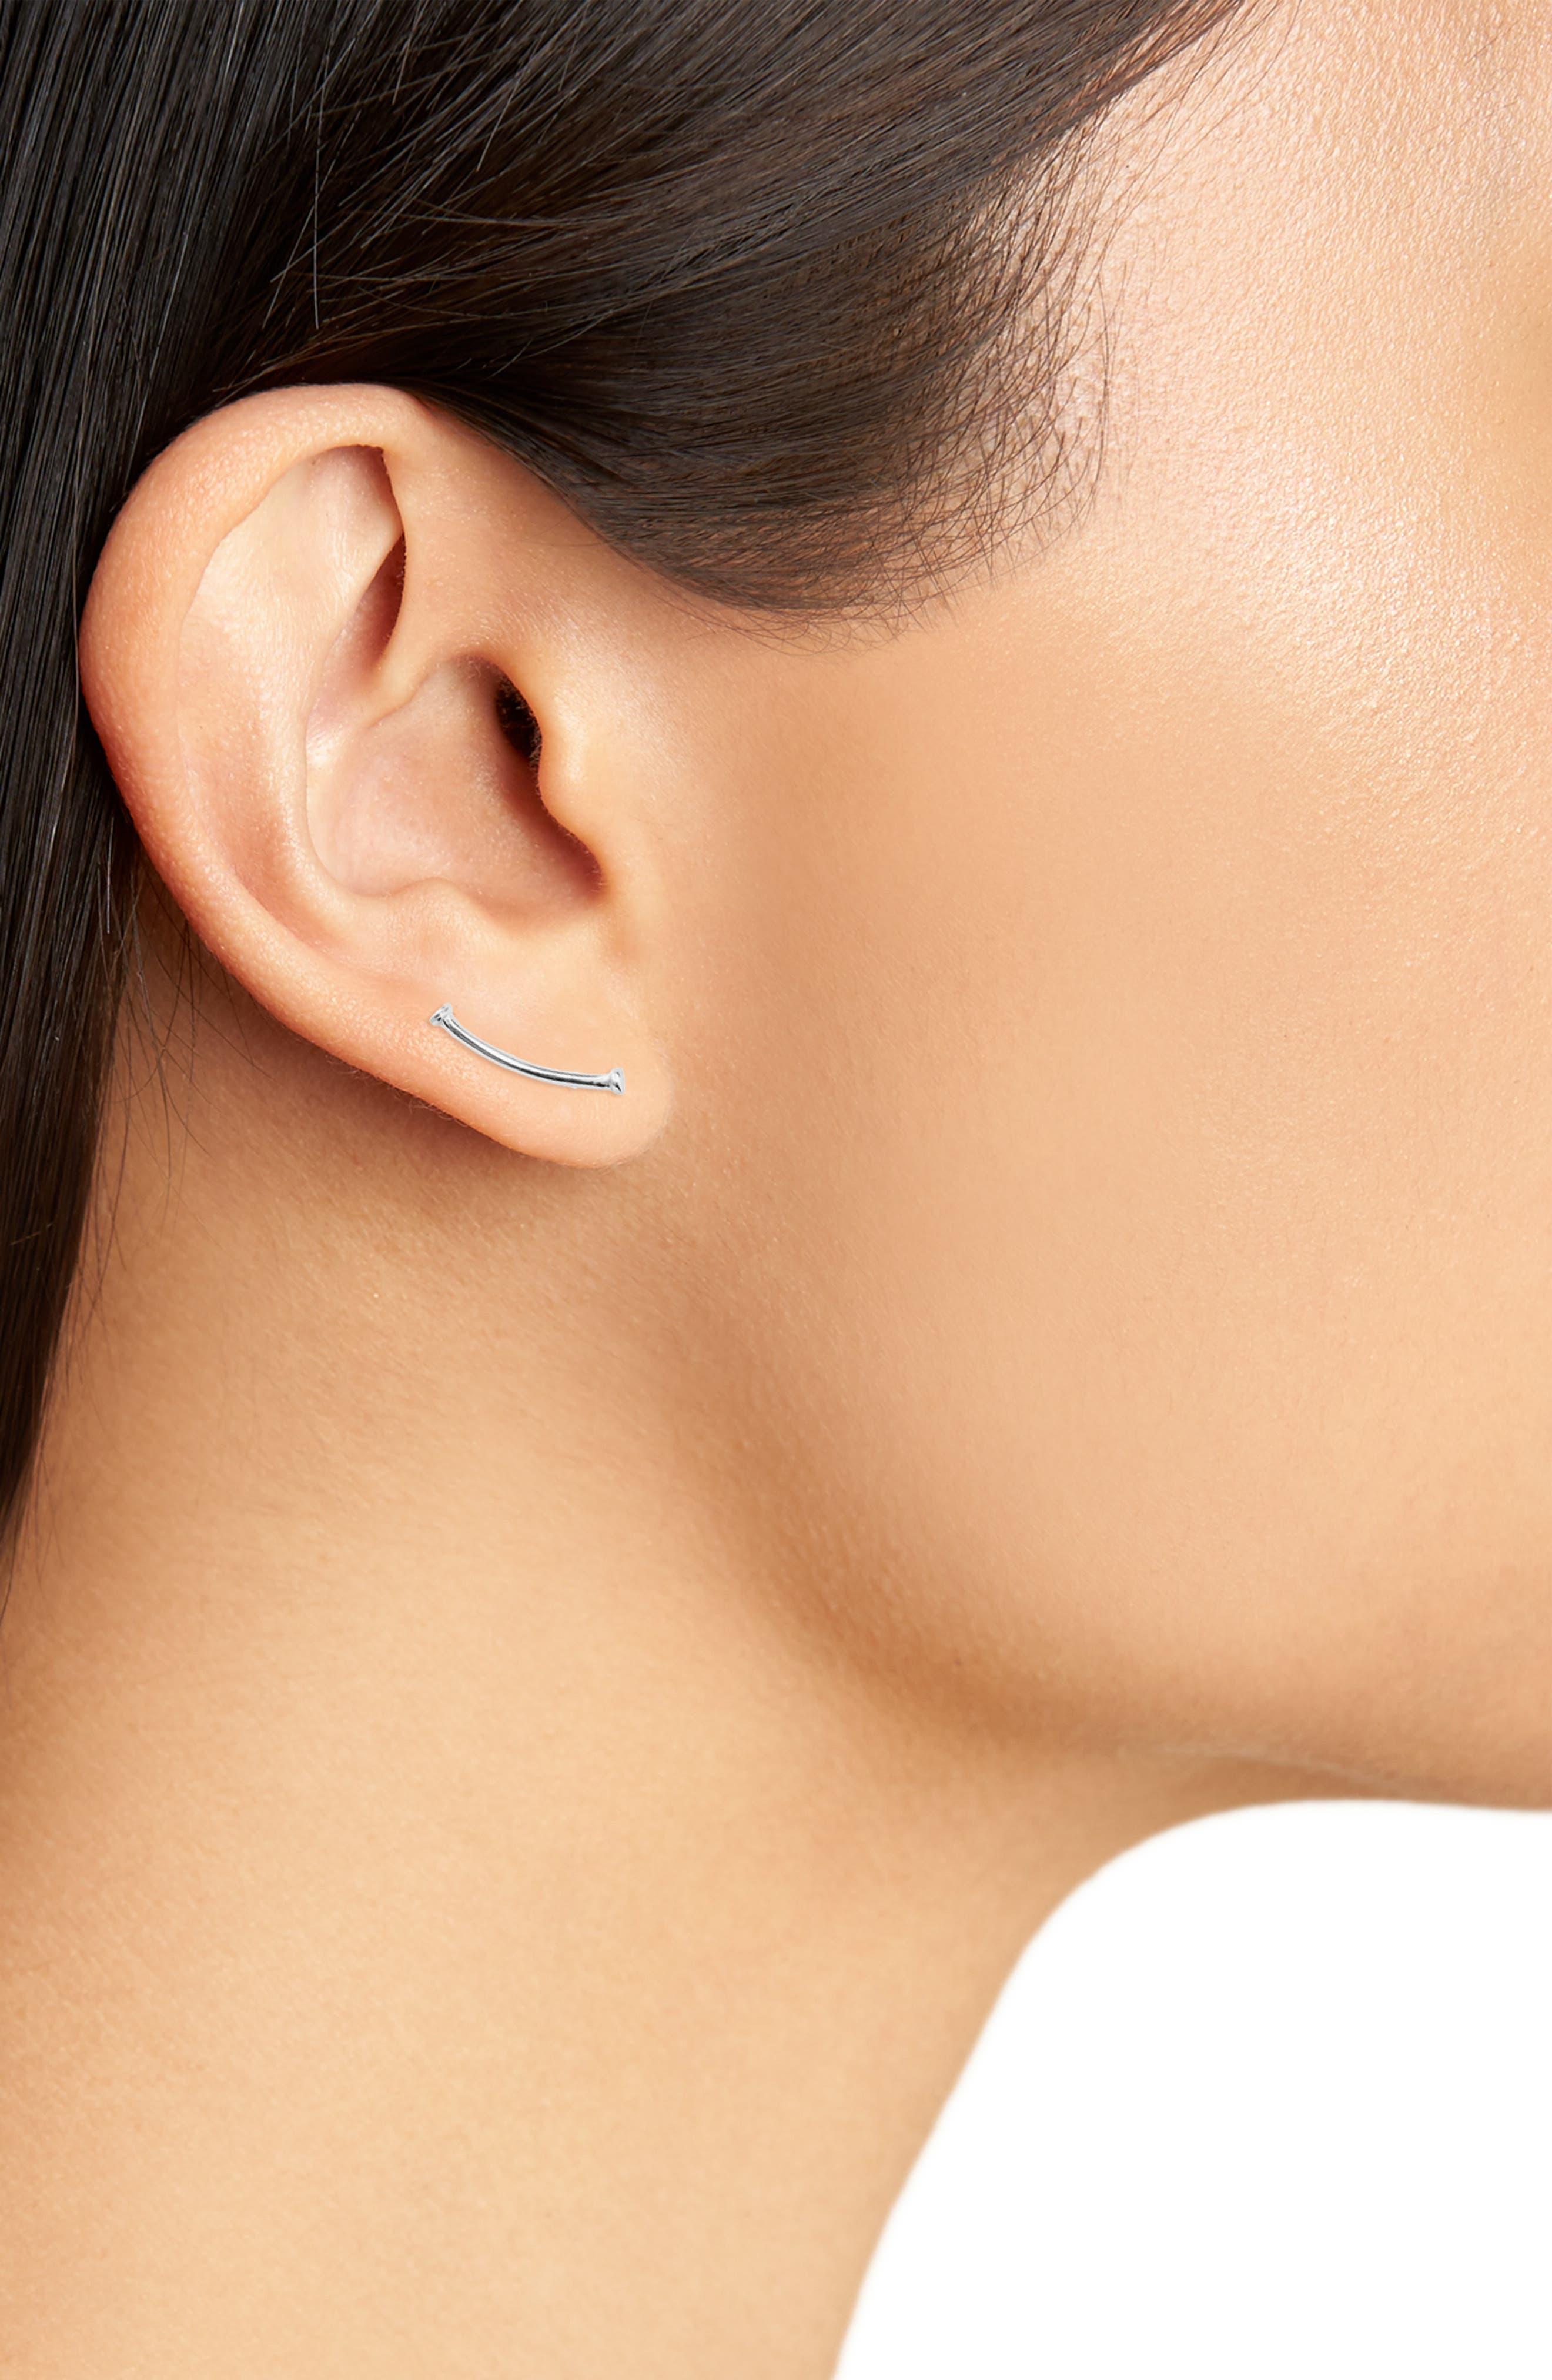 Skinny Curve Bar Stud Earrings,                             Alternate thumbnail 2, color,                             710